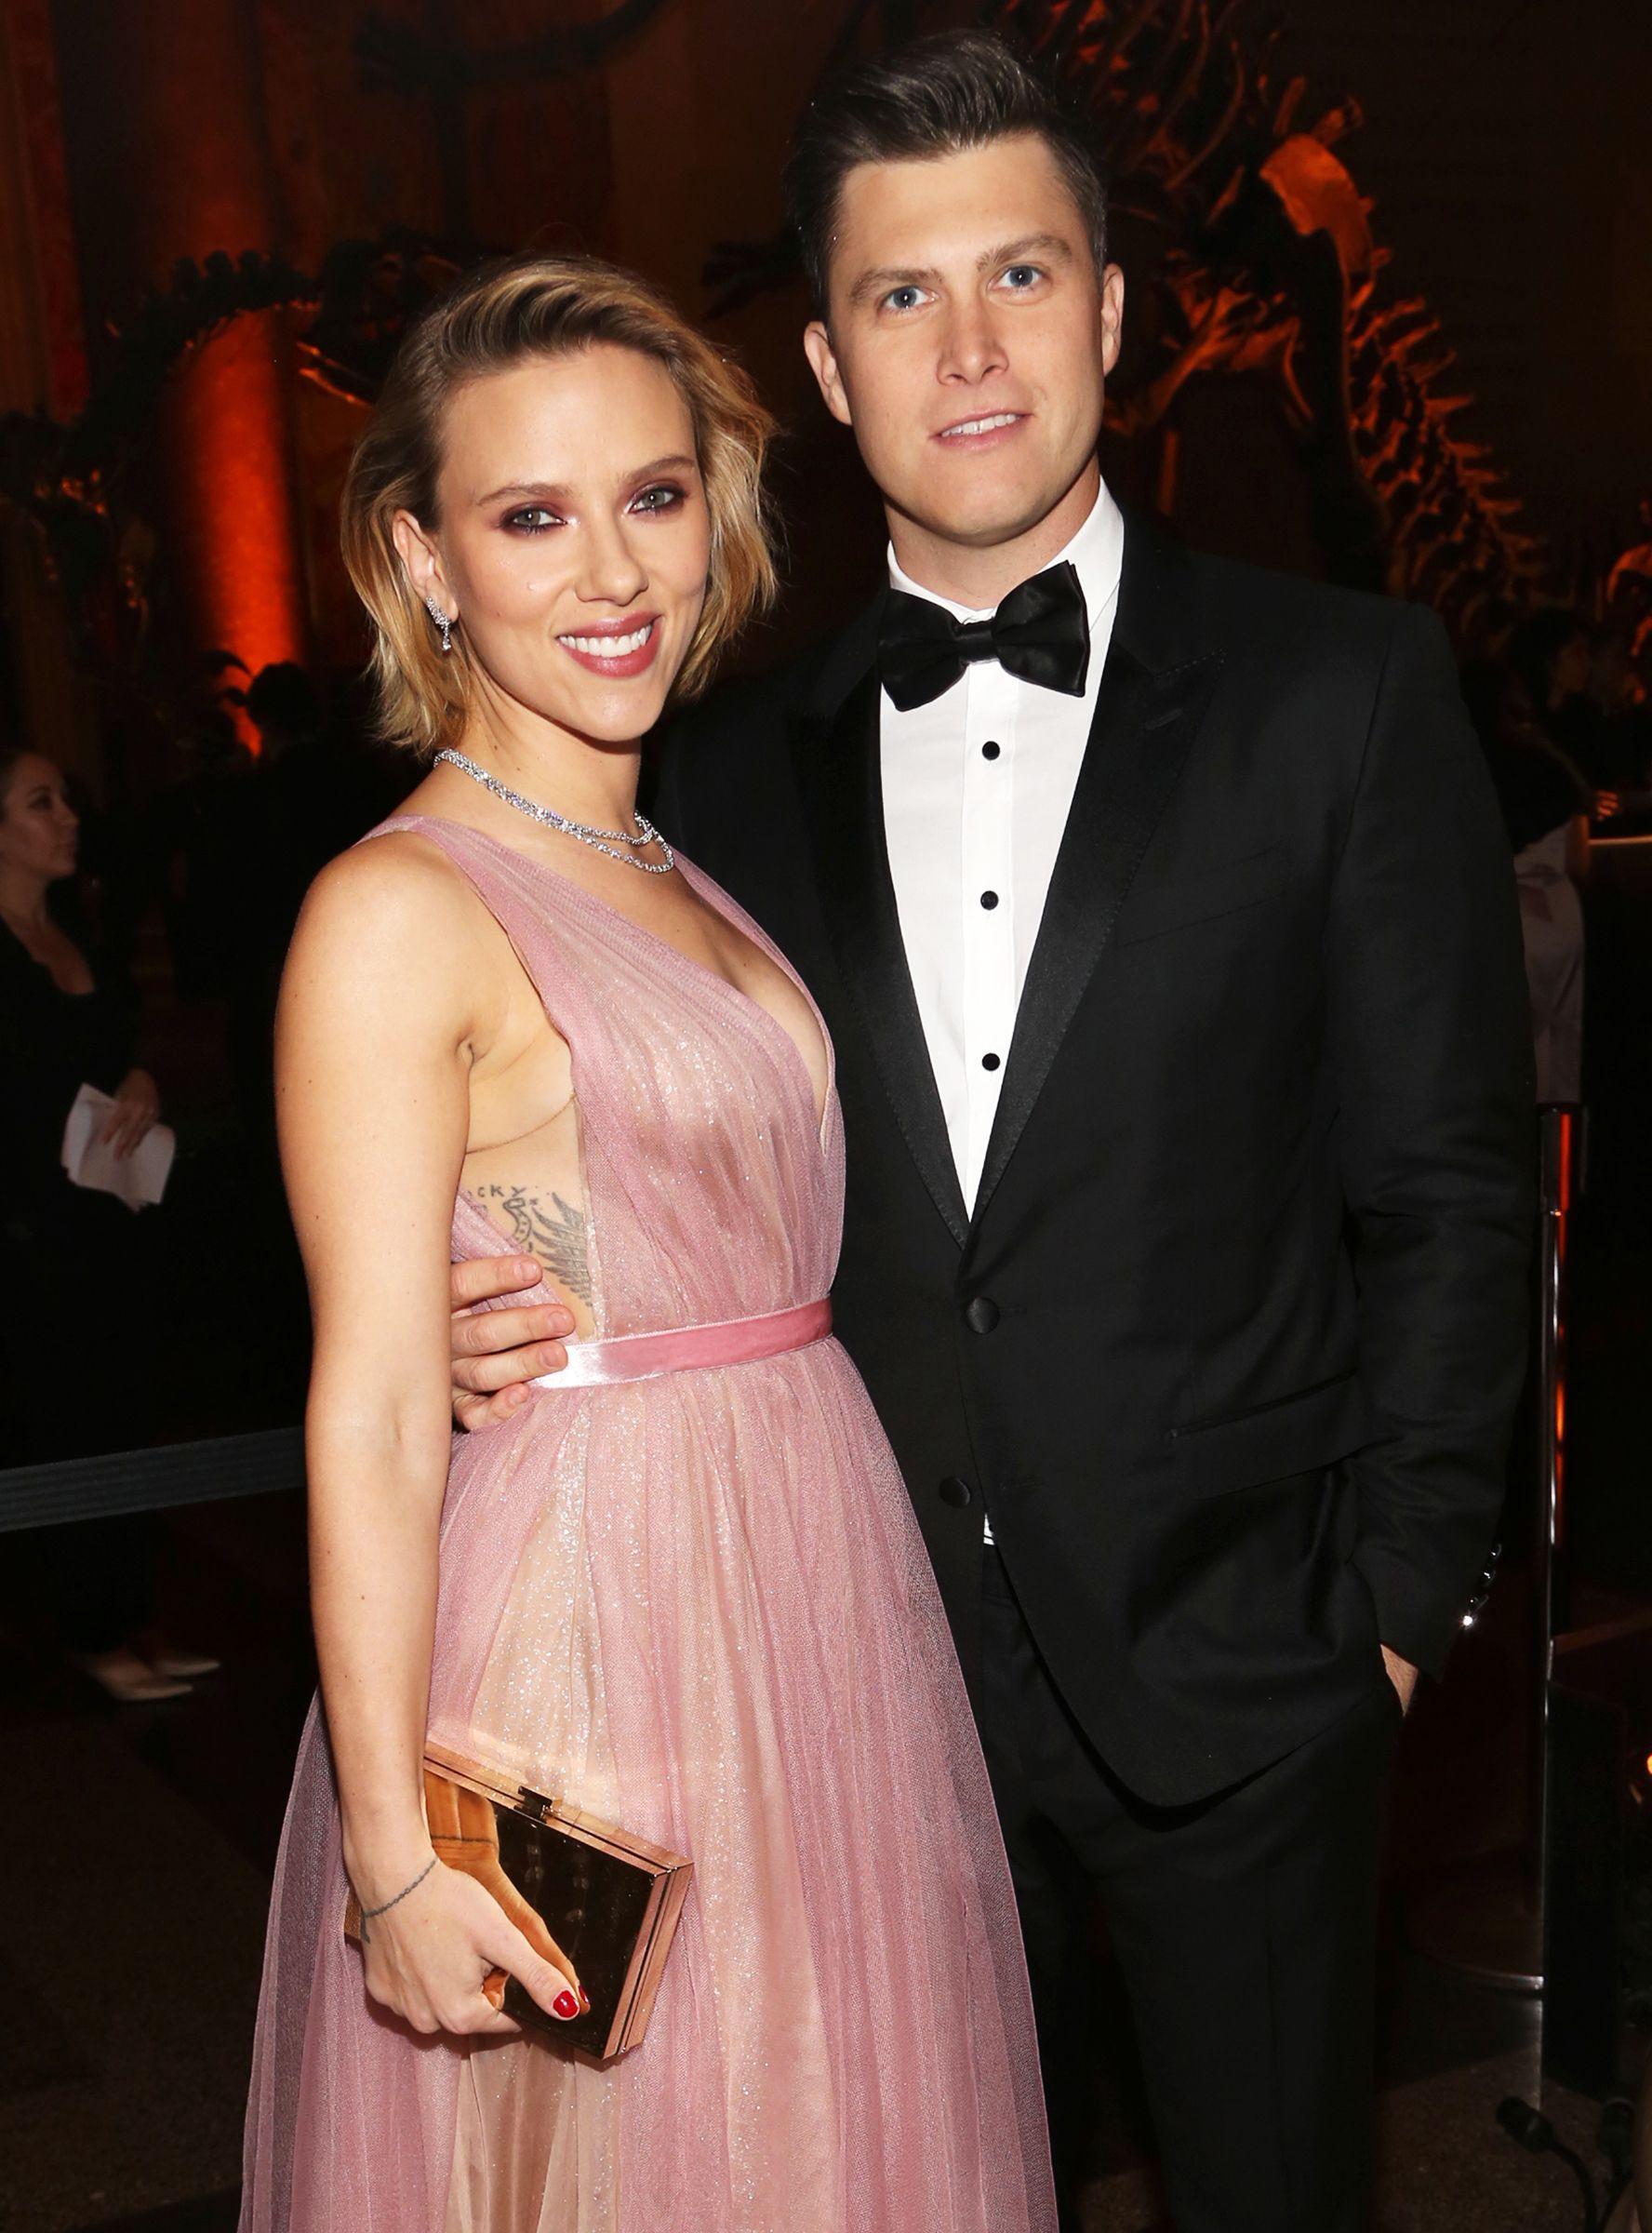 When Are Colin Jost & Scarlett Johansson Getting Married